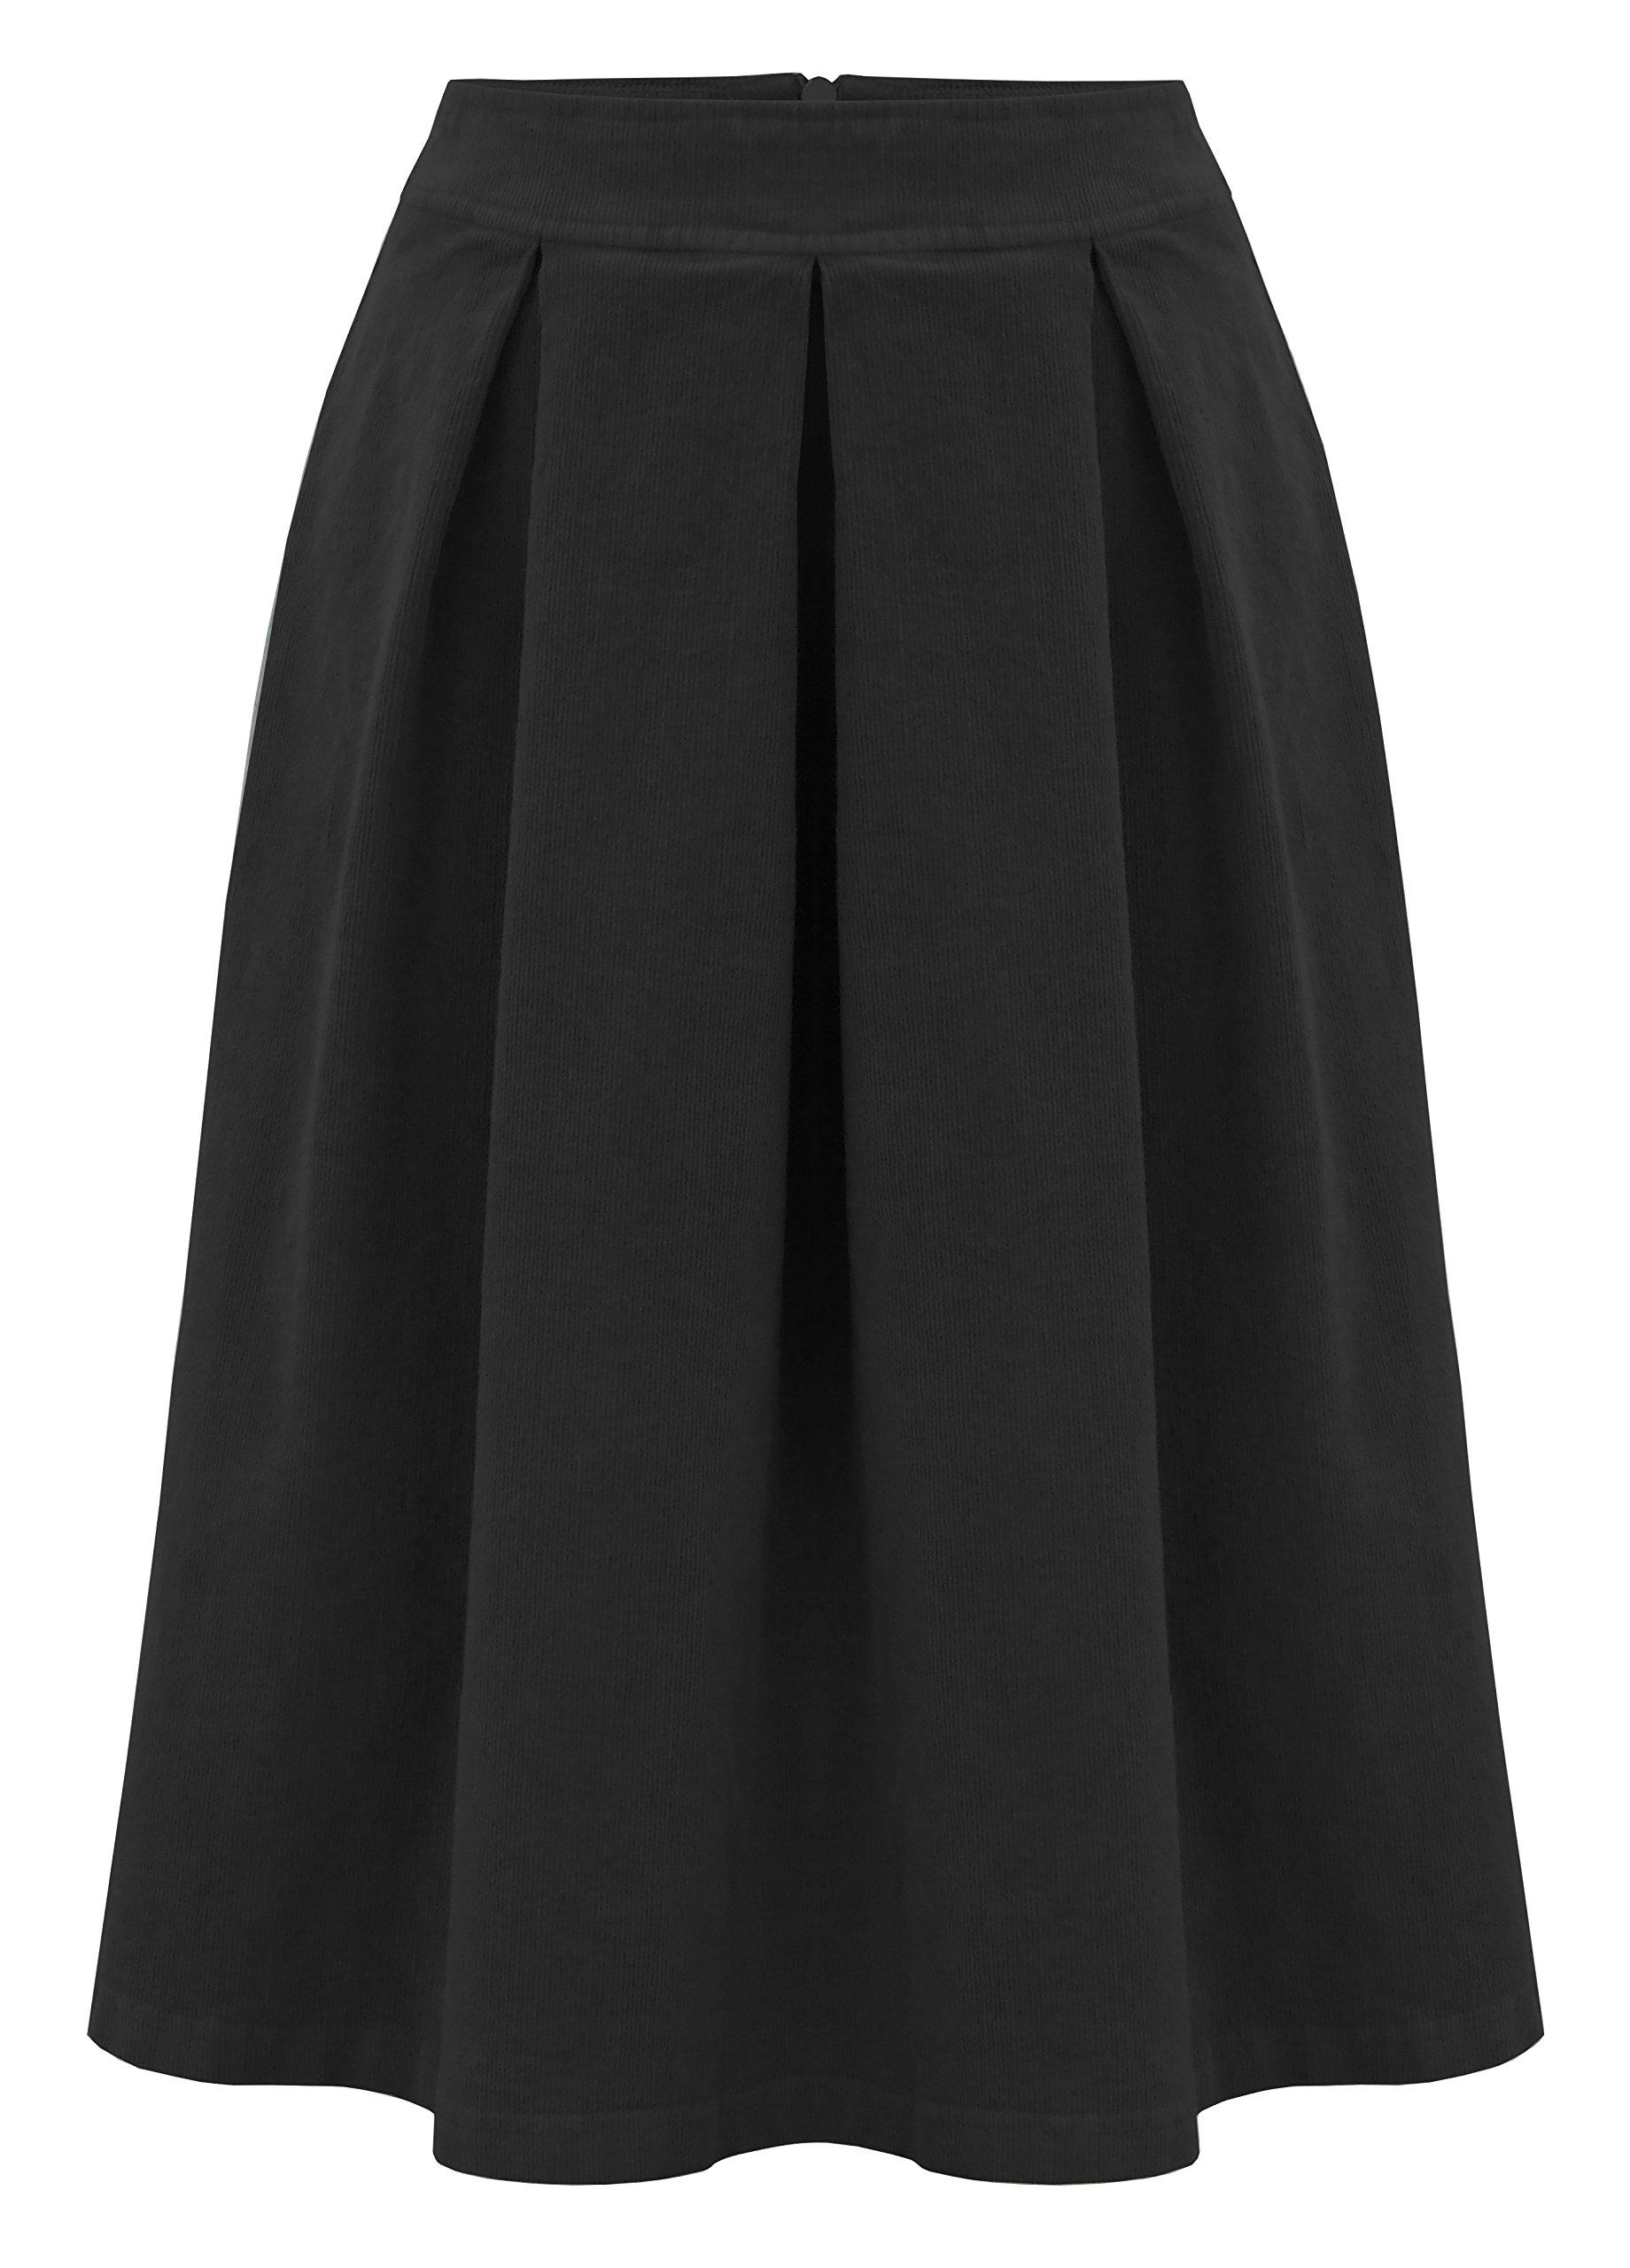 Baby'O Women's Retro Pleated Ultrasoft Plush Corduroy Skirt, black, m